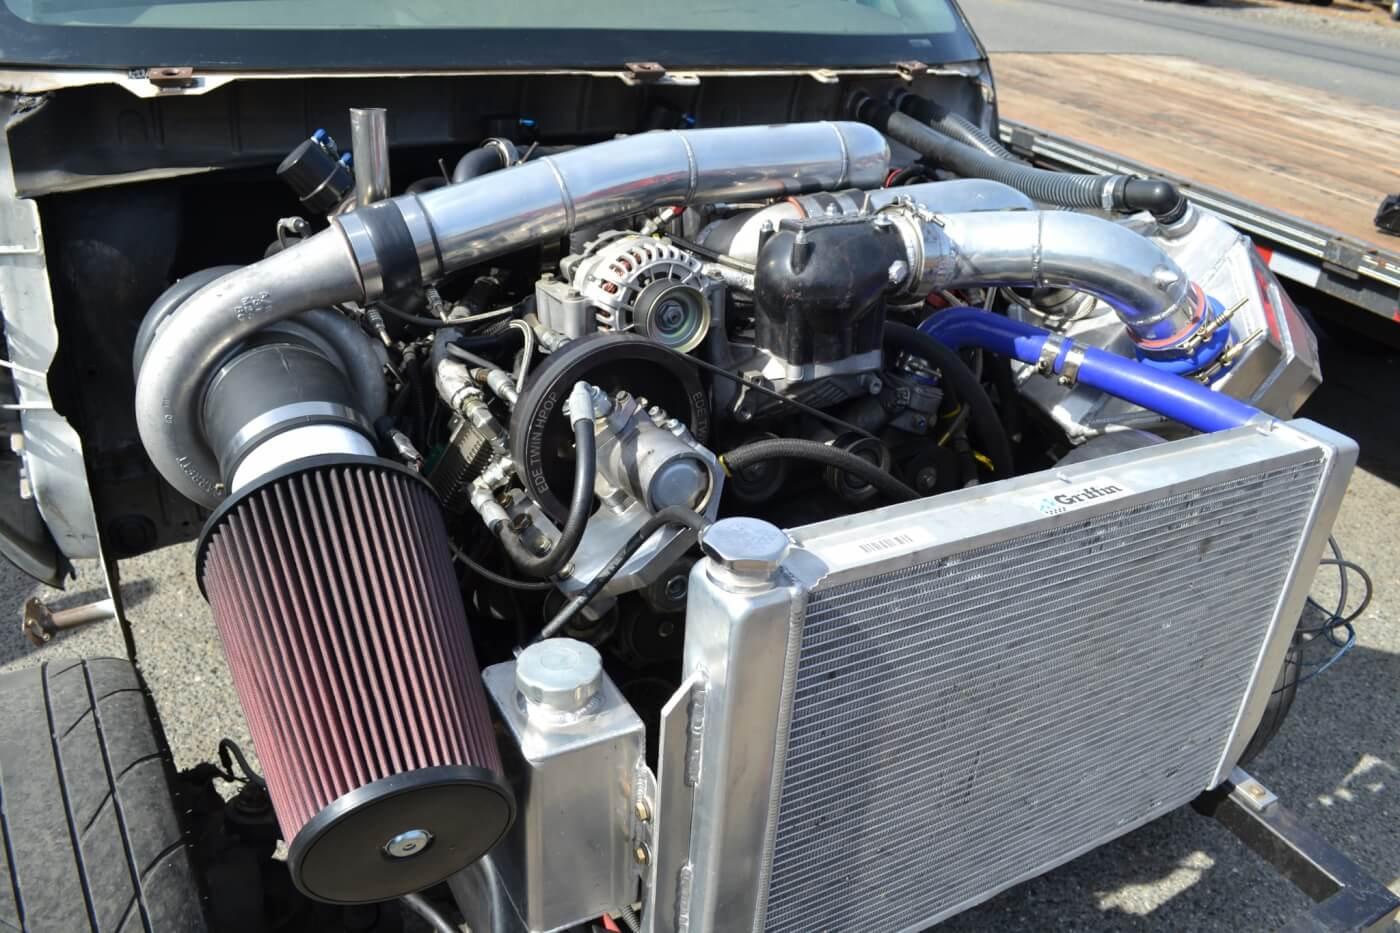 Under Pressure A 1 200 Horsepower 6 0l Drag Truck